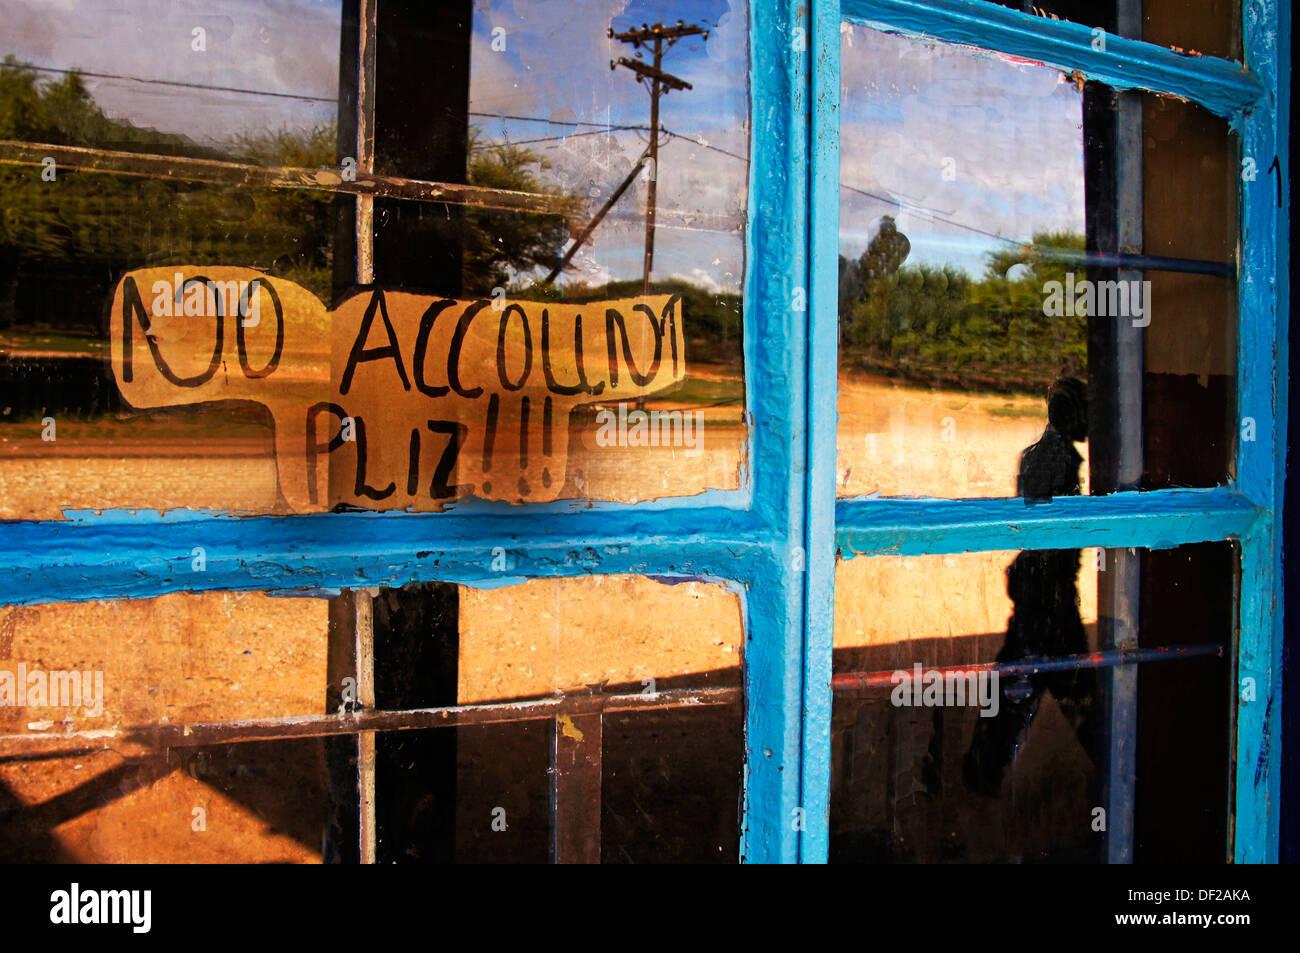 ´No Account Pliz!!!´ Please!!! on a window of a shop at D´Kar San bushman district area, Ghanzi Farms, Botswana - Stock Image